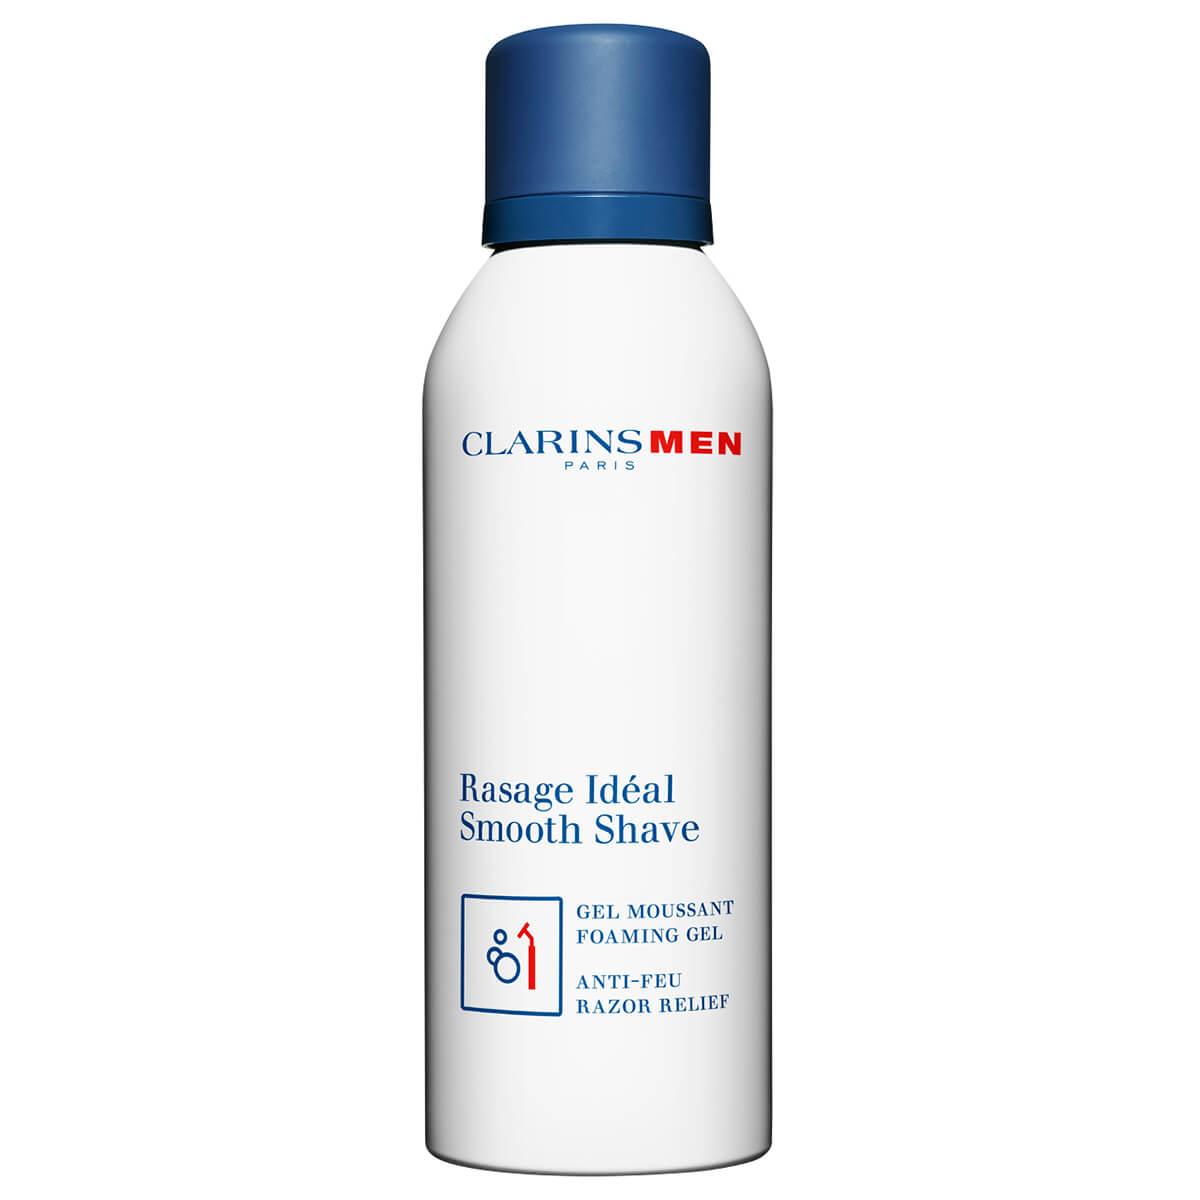 Espuma de Barbear ClarinsMen Smooth Shave 150ml